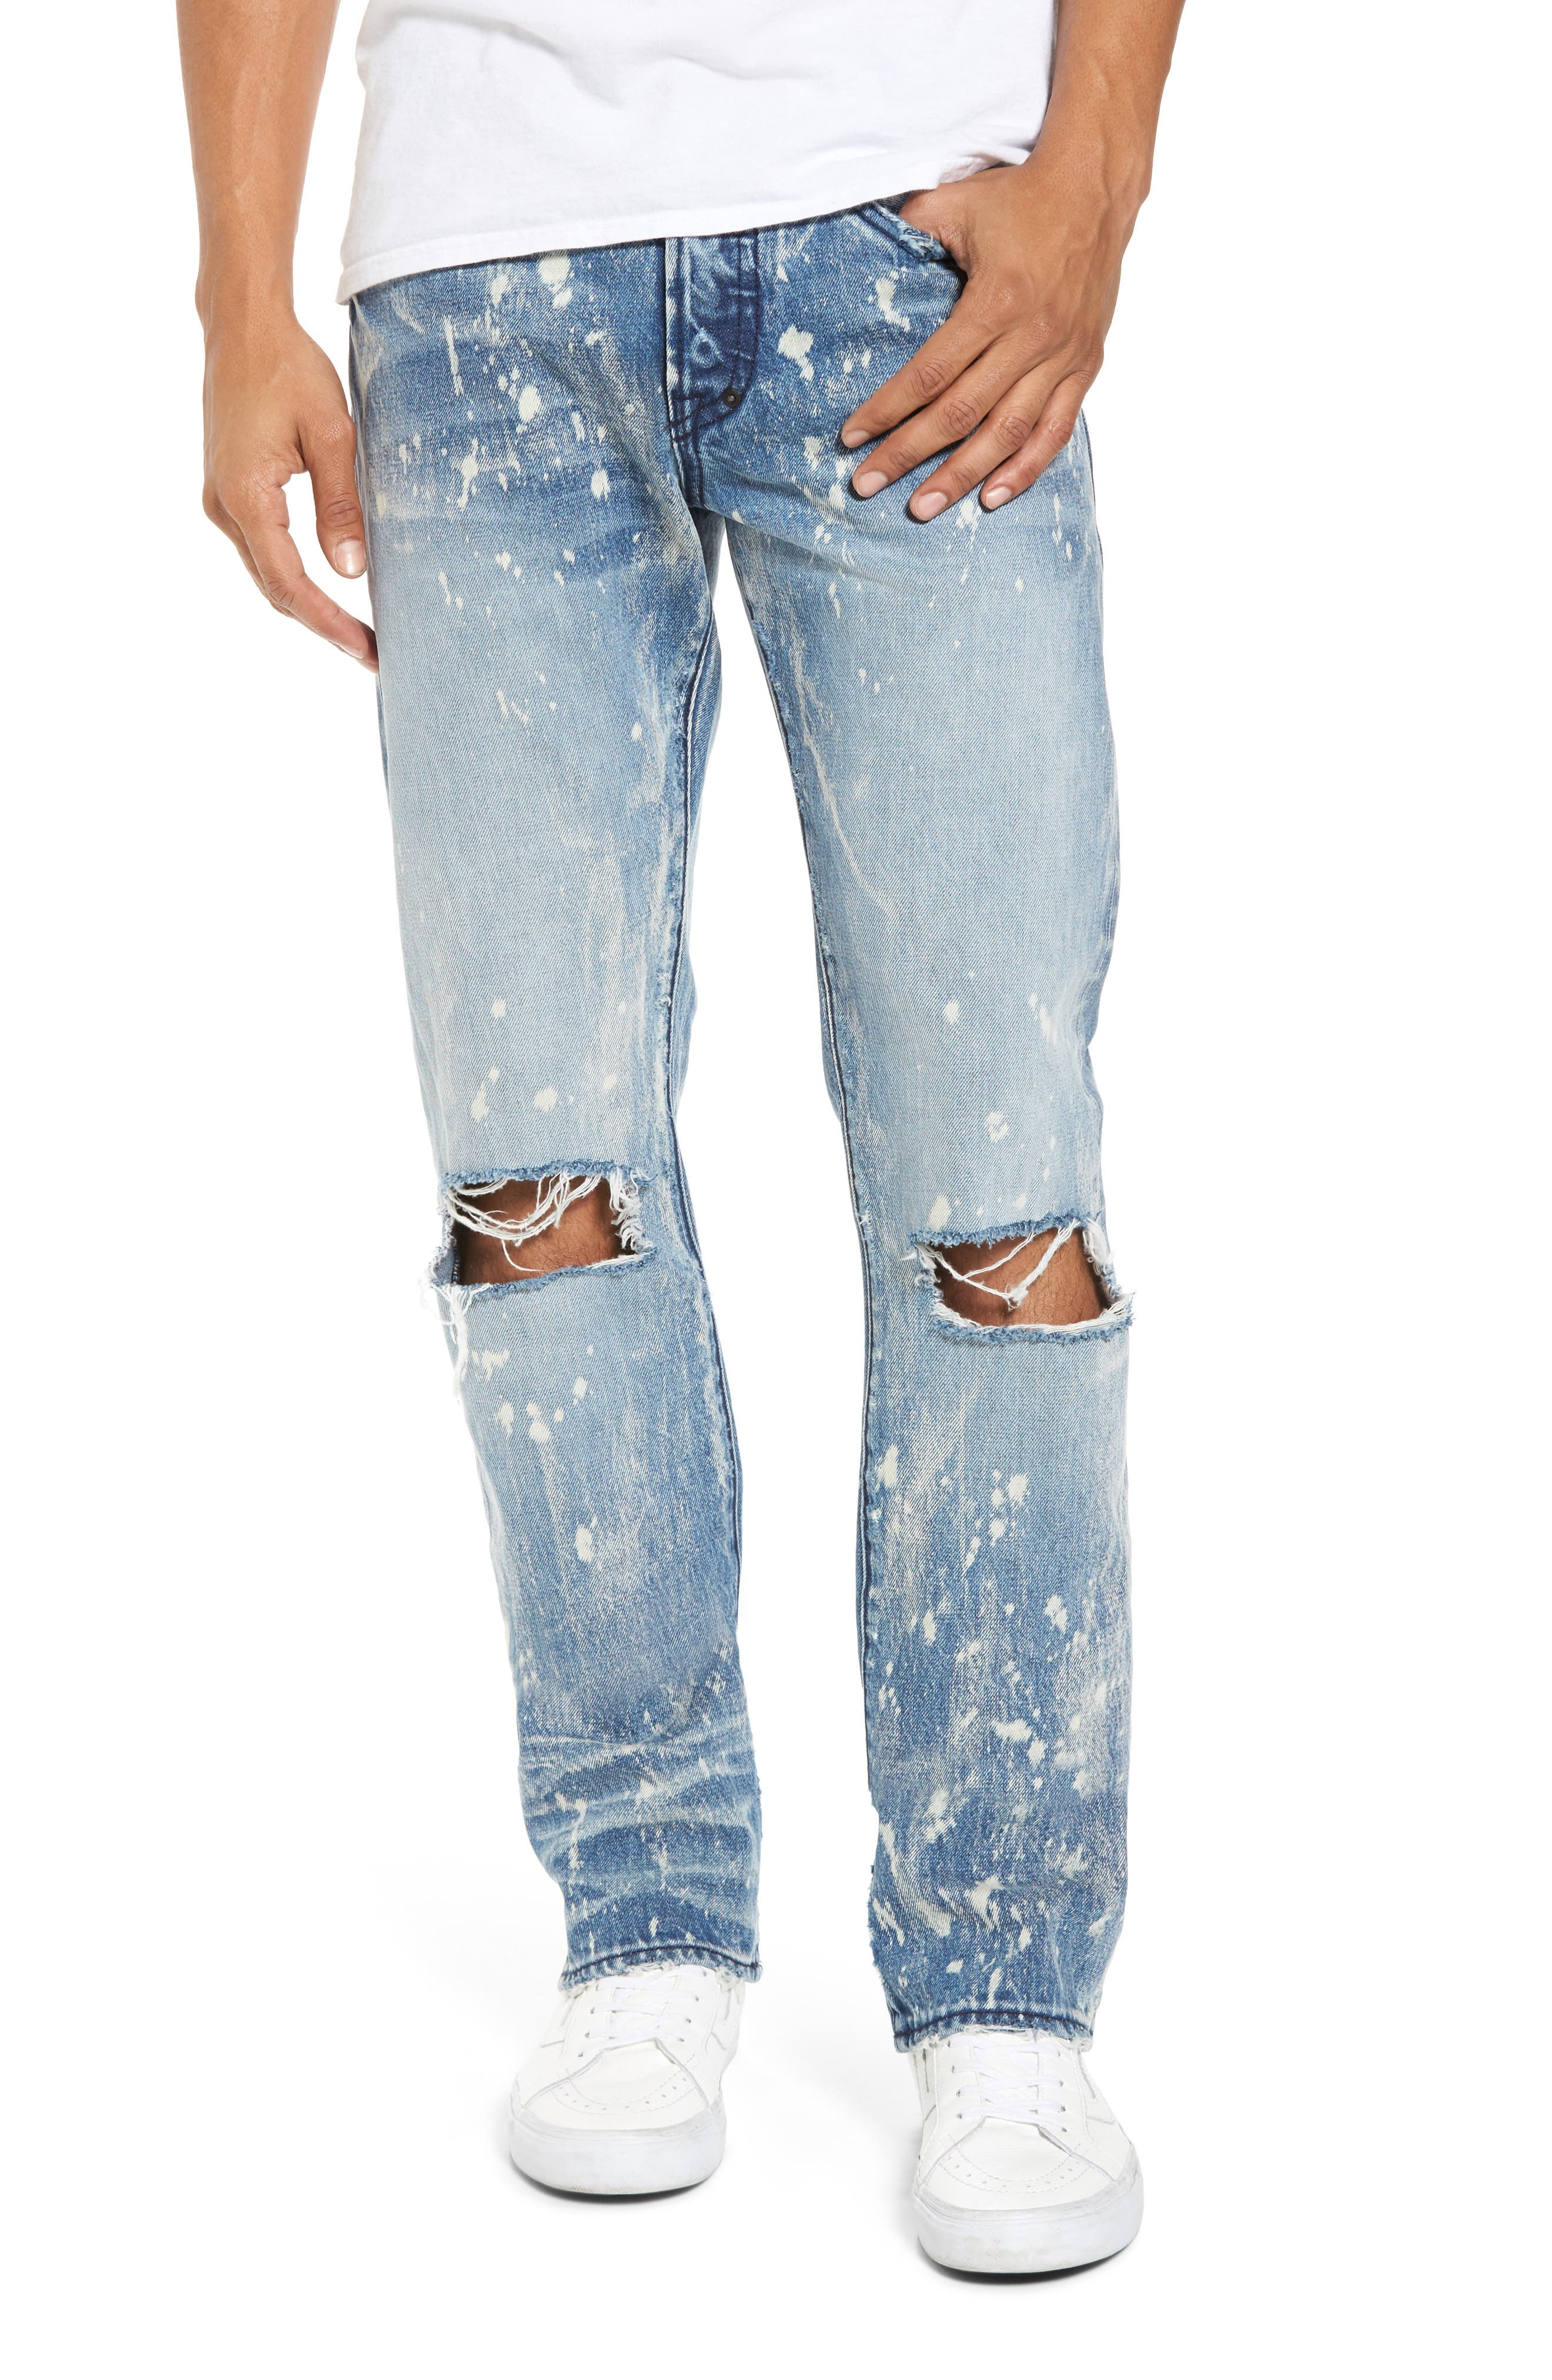 Demon Slim Straight Leg Jeans,                             Main thumbnail 1, color,                             490